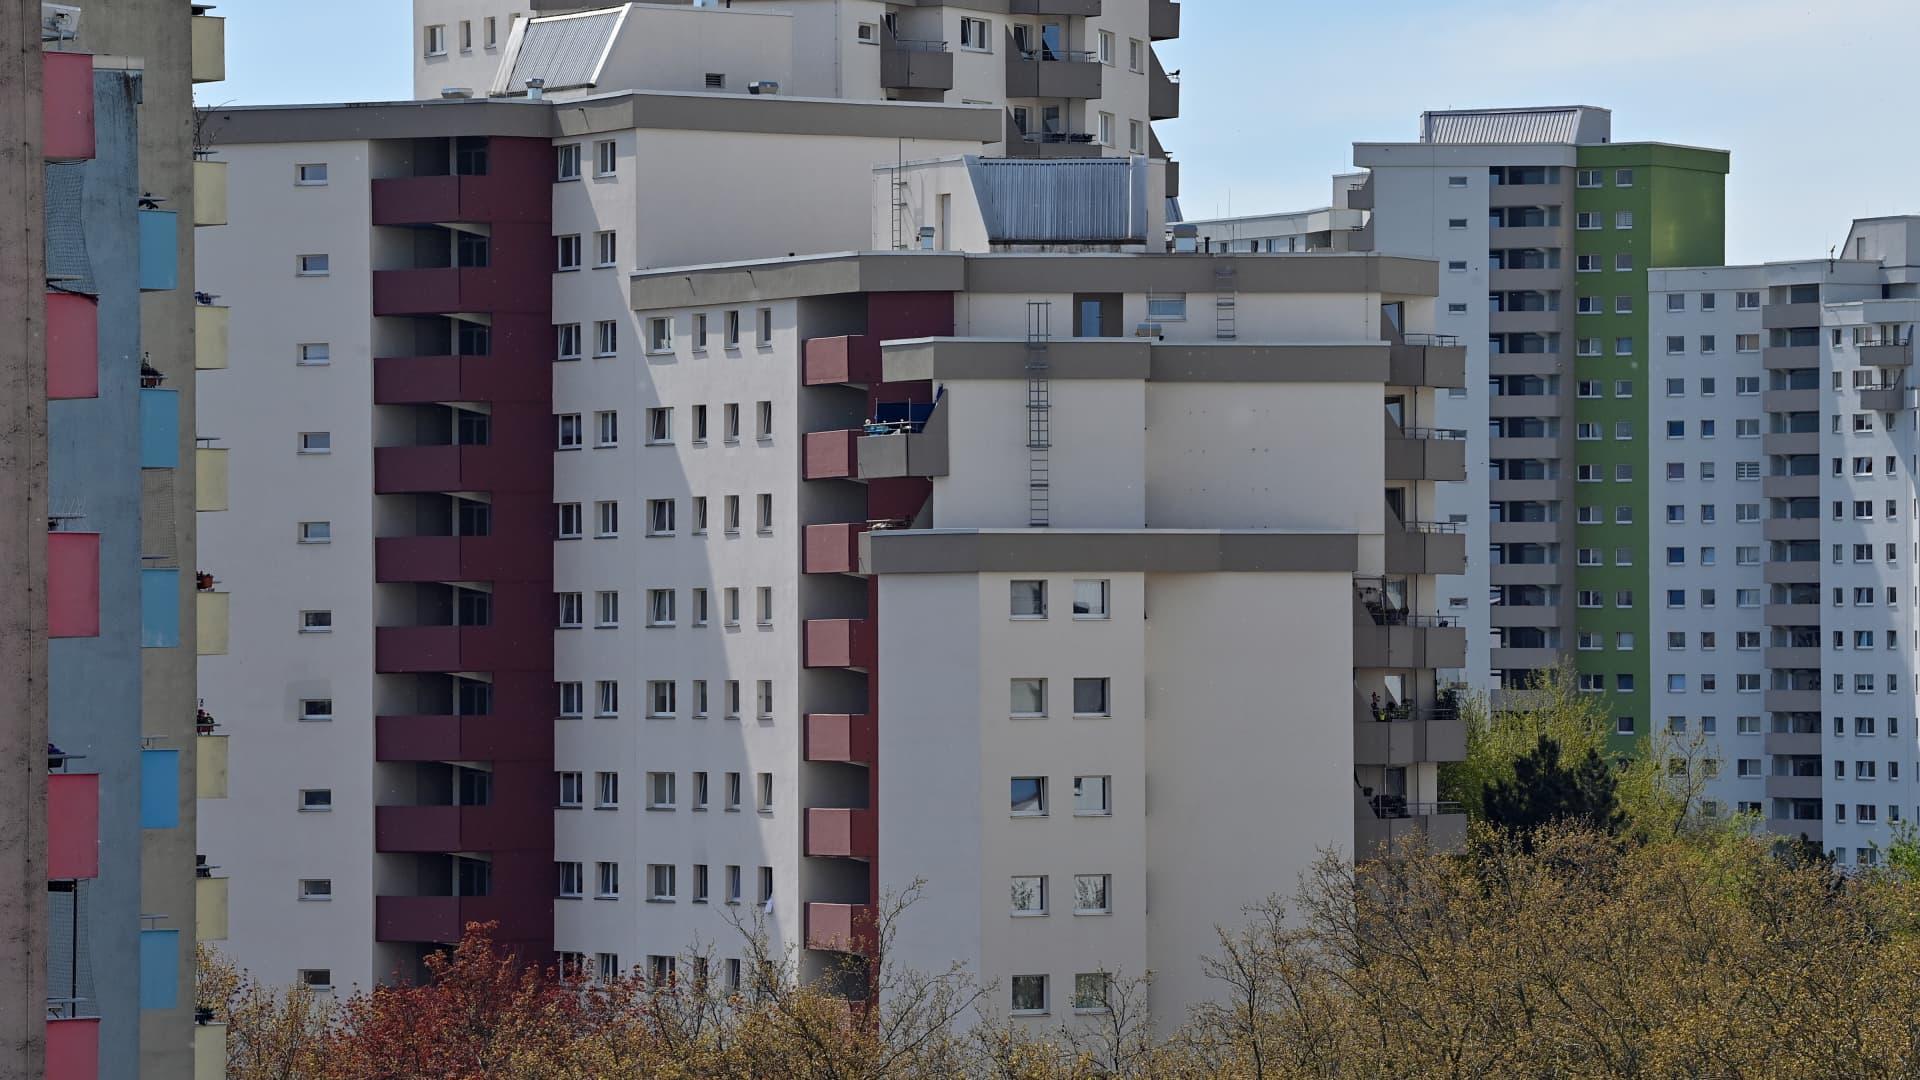 High-rise buildings in the Märkisches Viertel in Berlin.